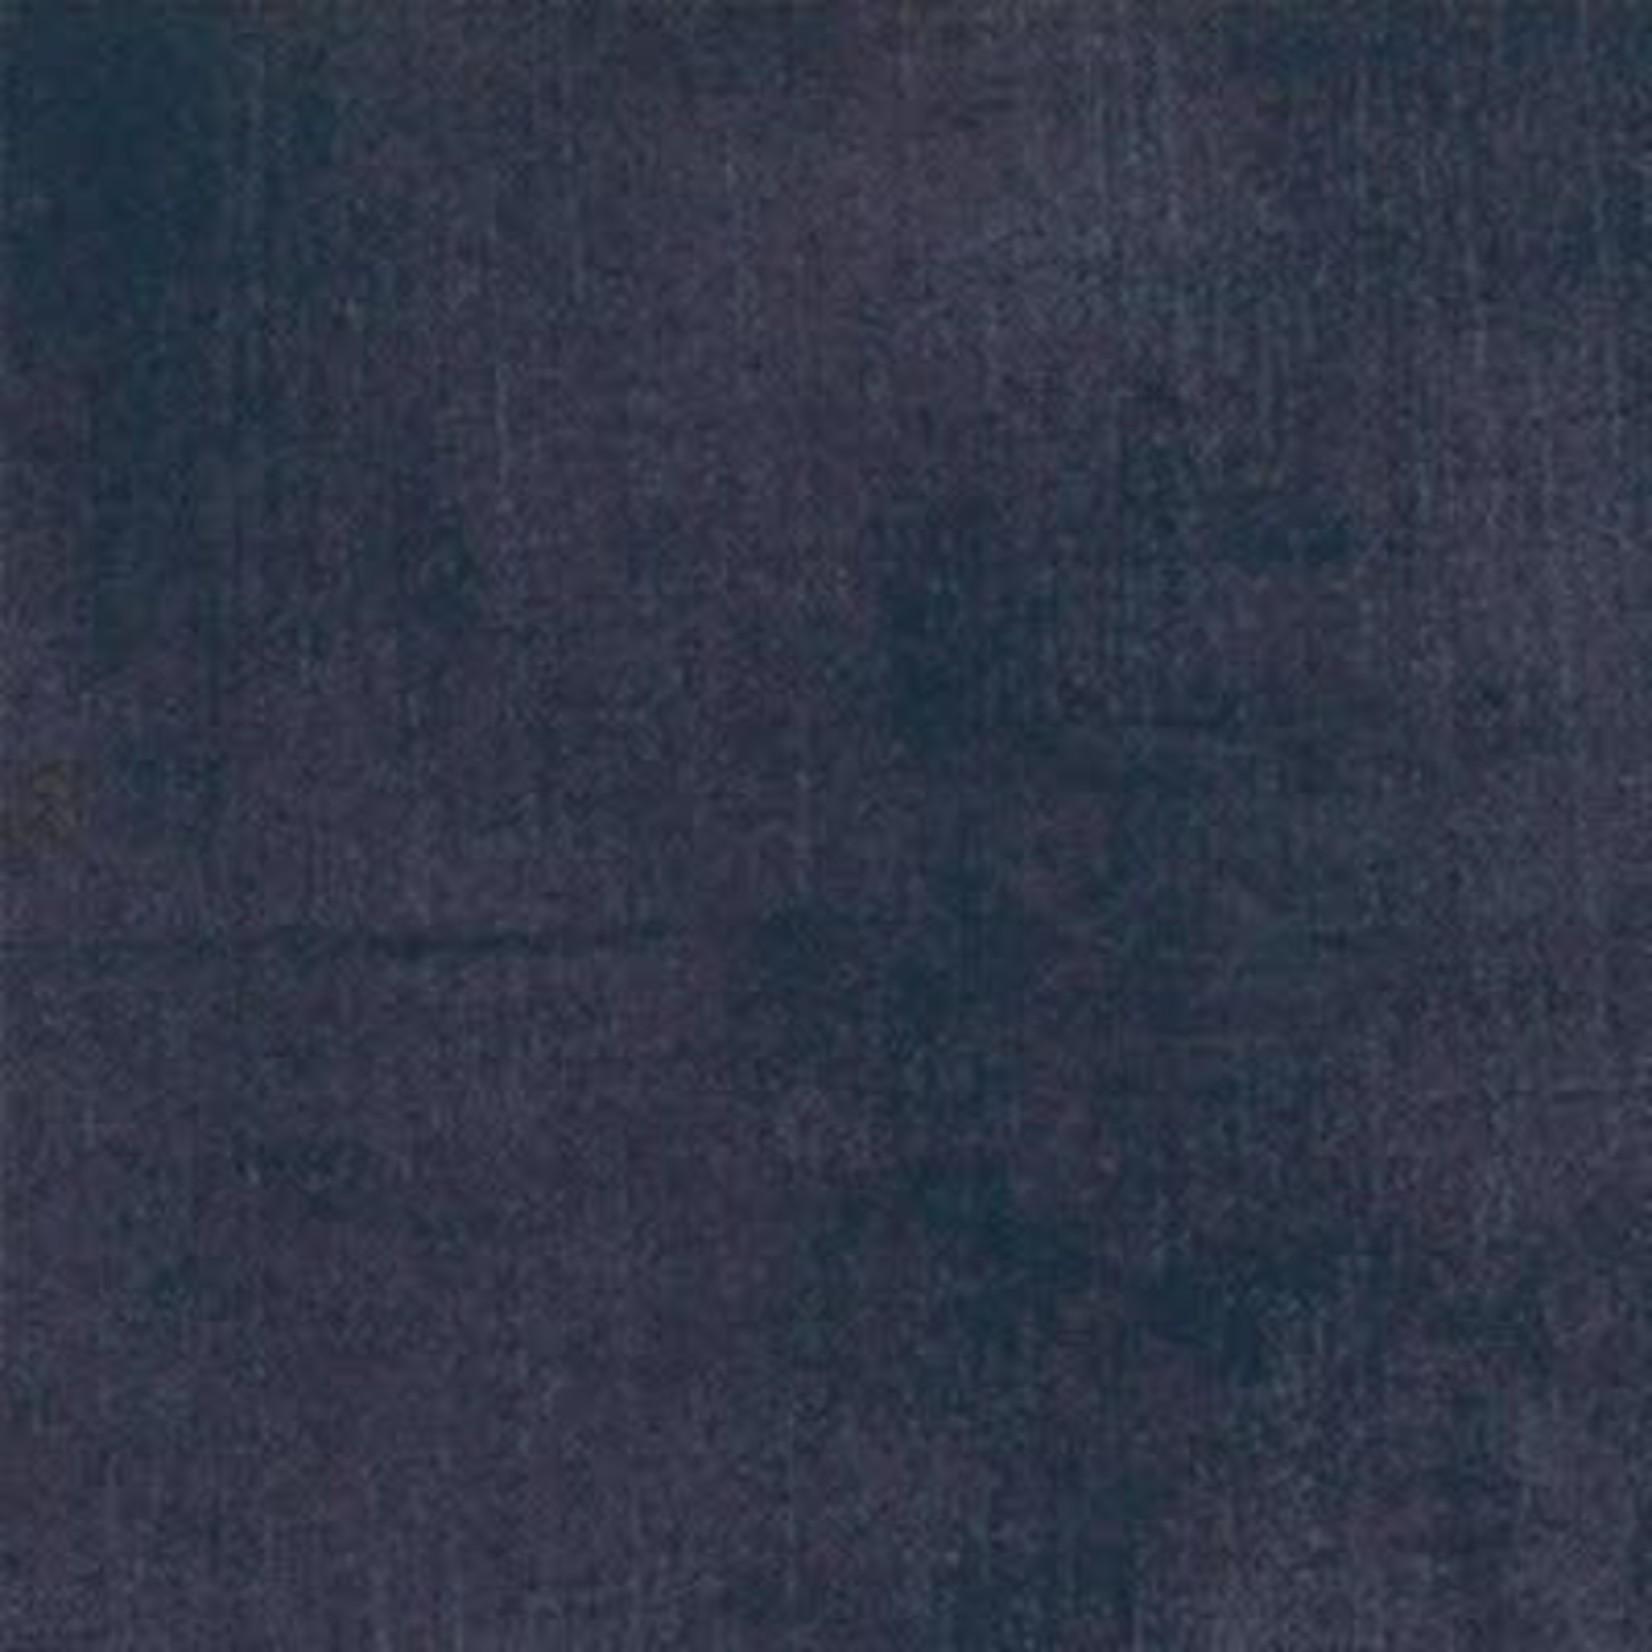 Moda Grunge Basics Grunge - Picnic per cm or $20/m